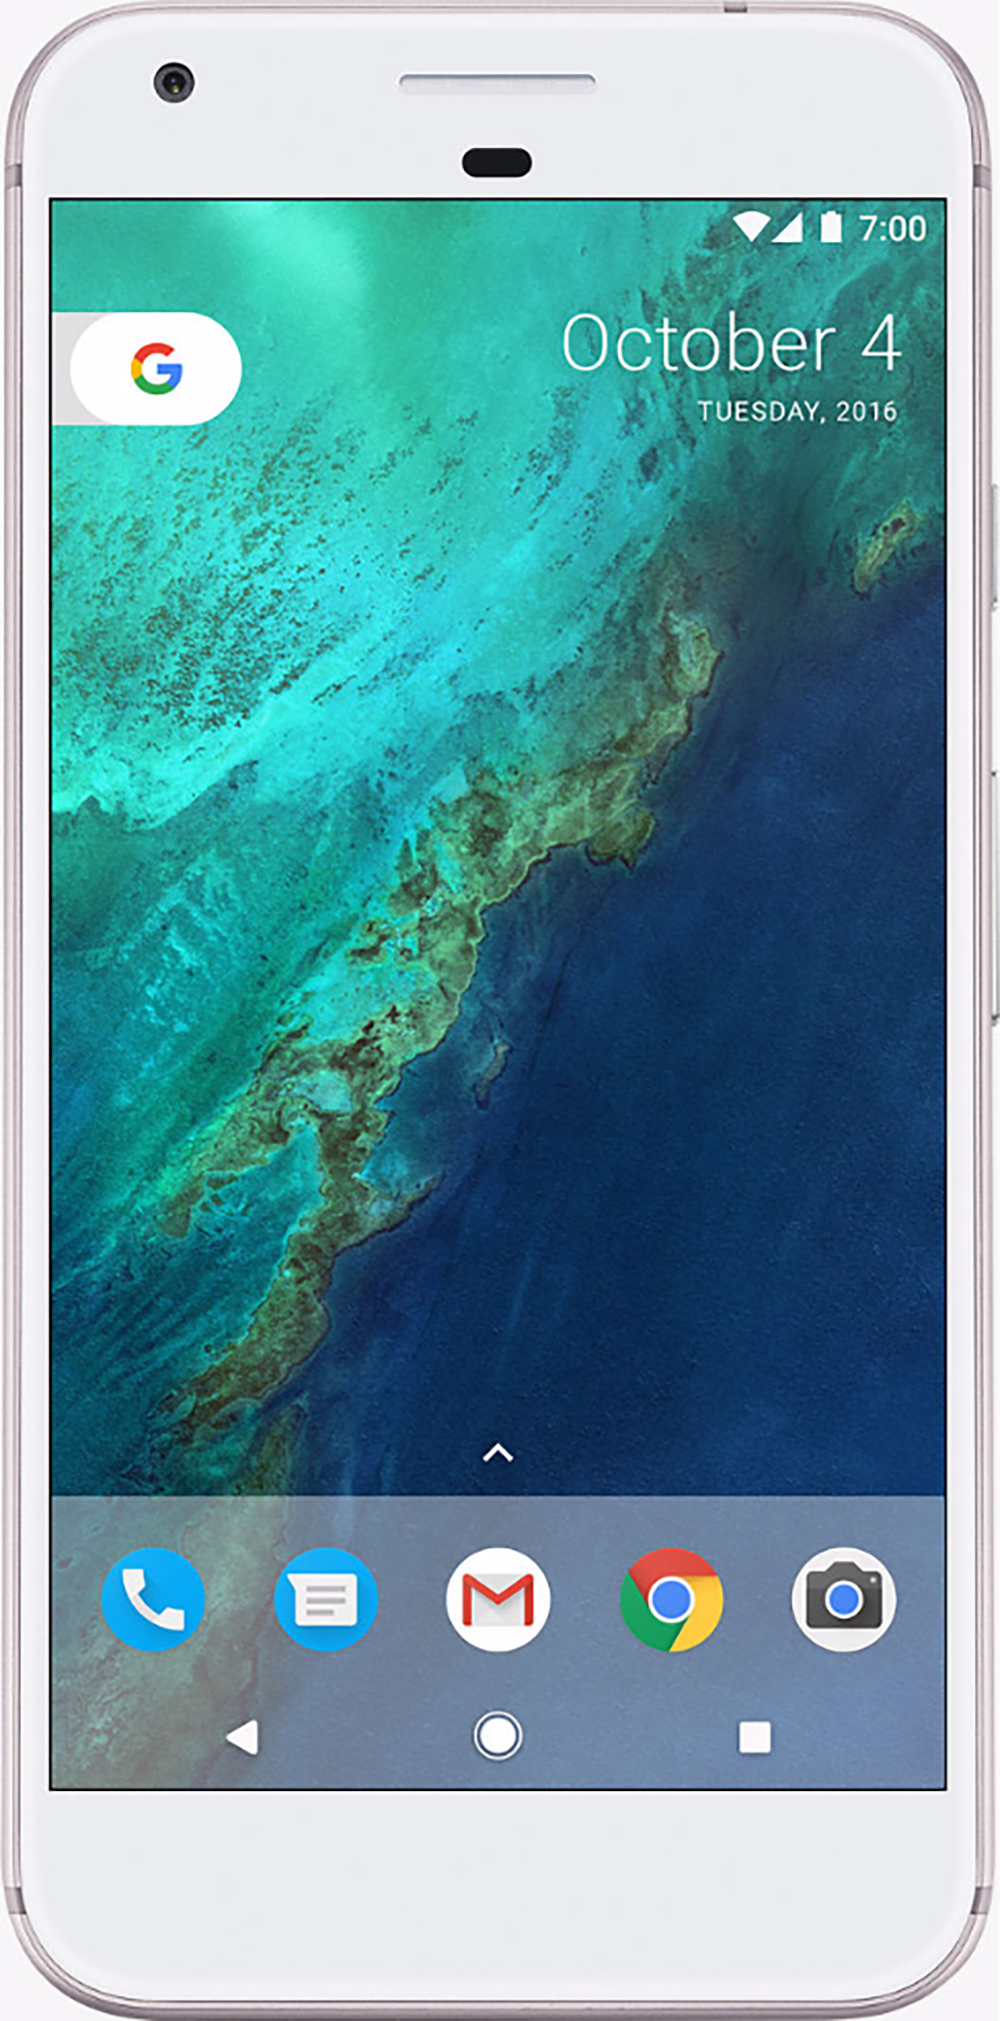 Google Pixel XL 32GB Unlocked GSM Phone w/ 12.3MP Camera - Very...